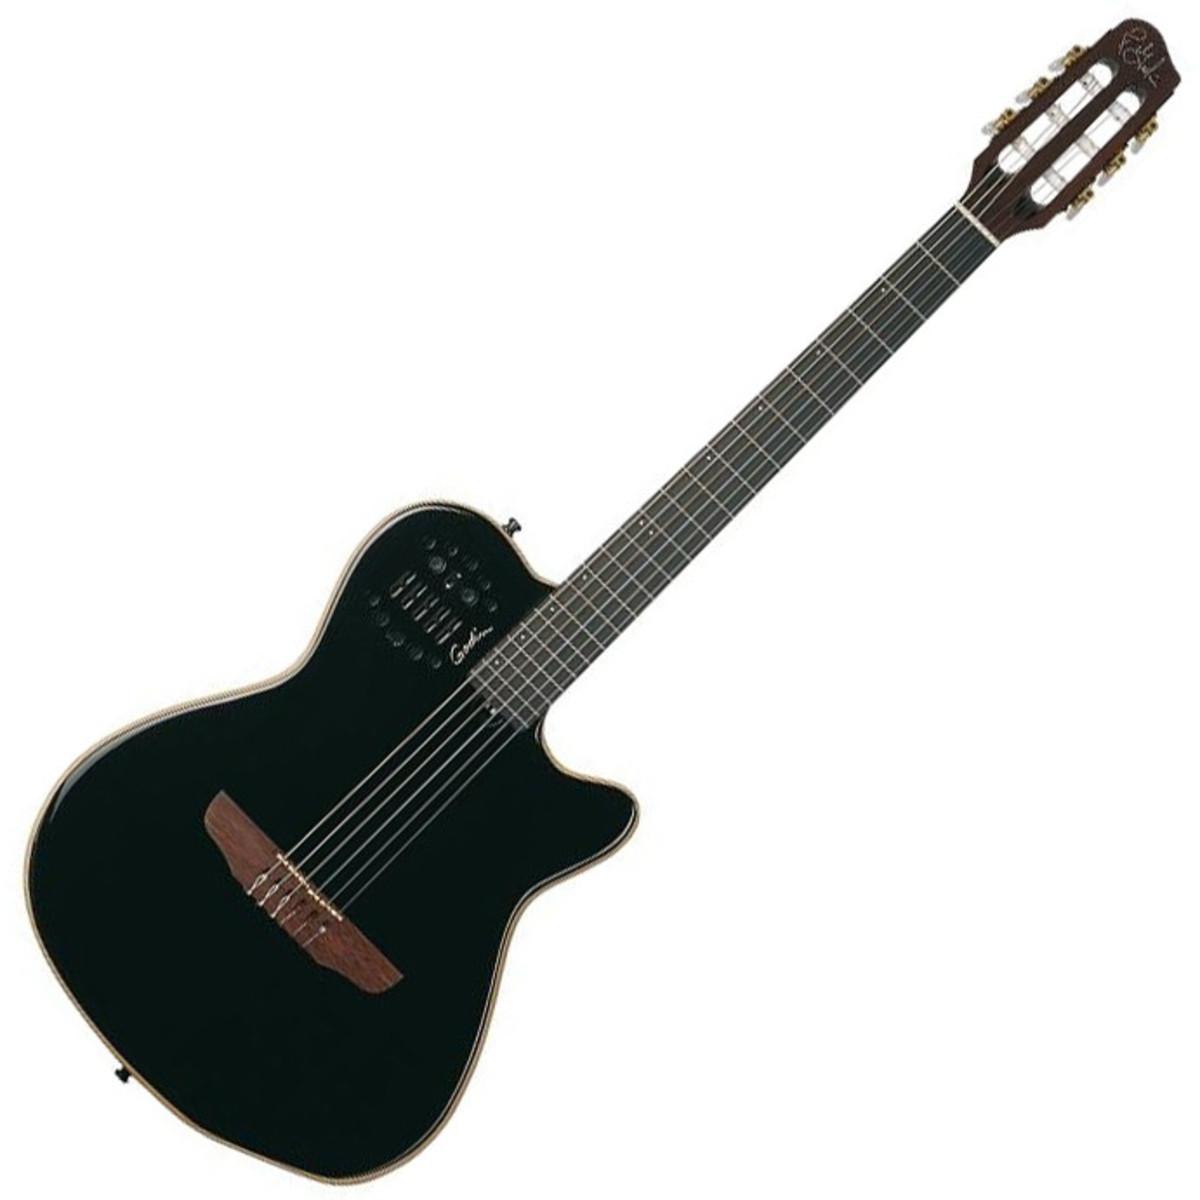 Godin Acs Sa Nylon Acoustic Guitar With Synth Access Black At Electronics Dstevensdesign Pearl Loading Zoom